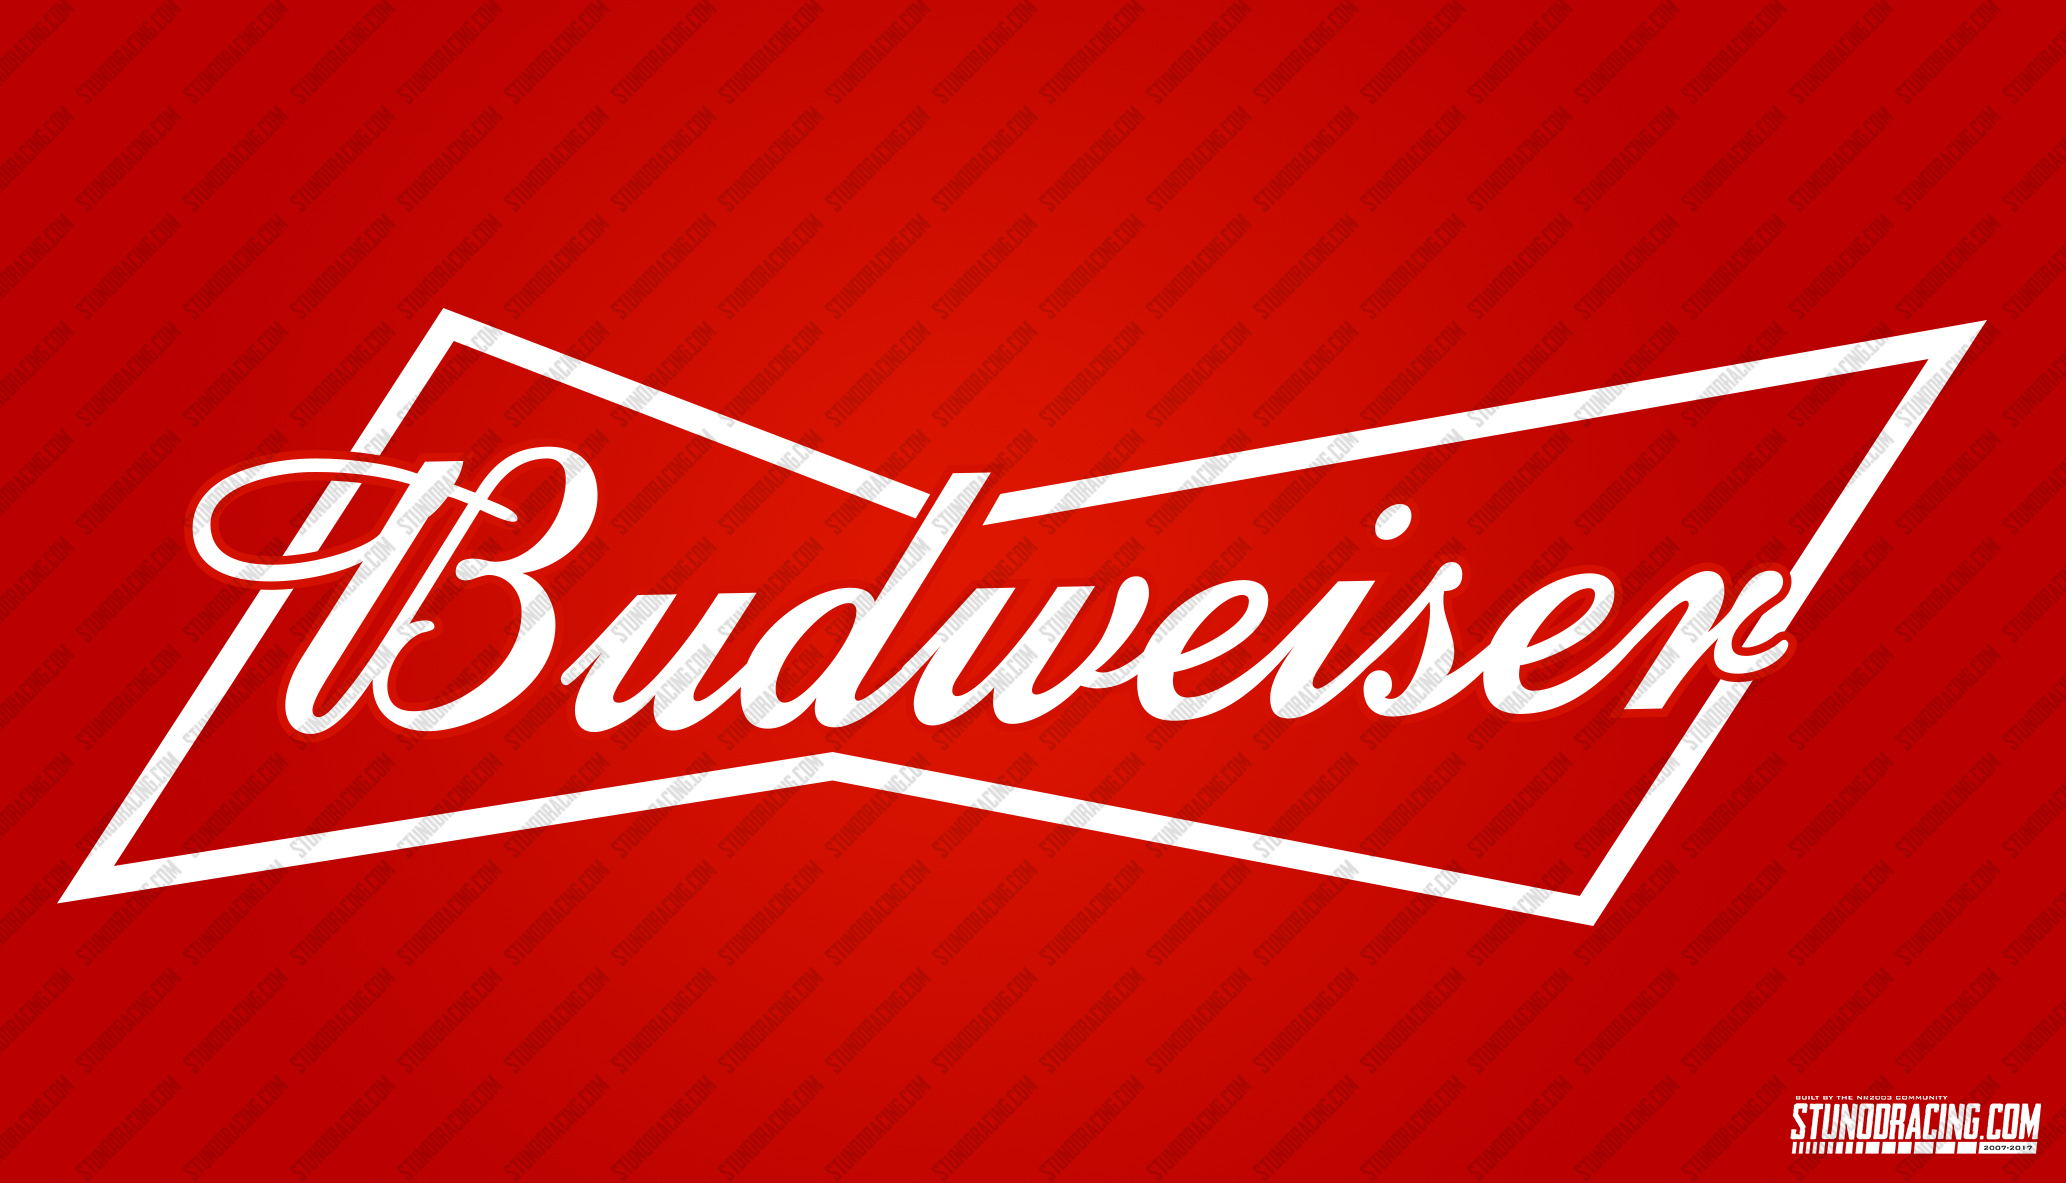 Stunodracing_Budweiser_Scripts-Logov2.jpg